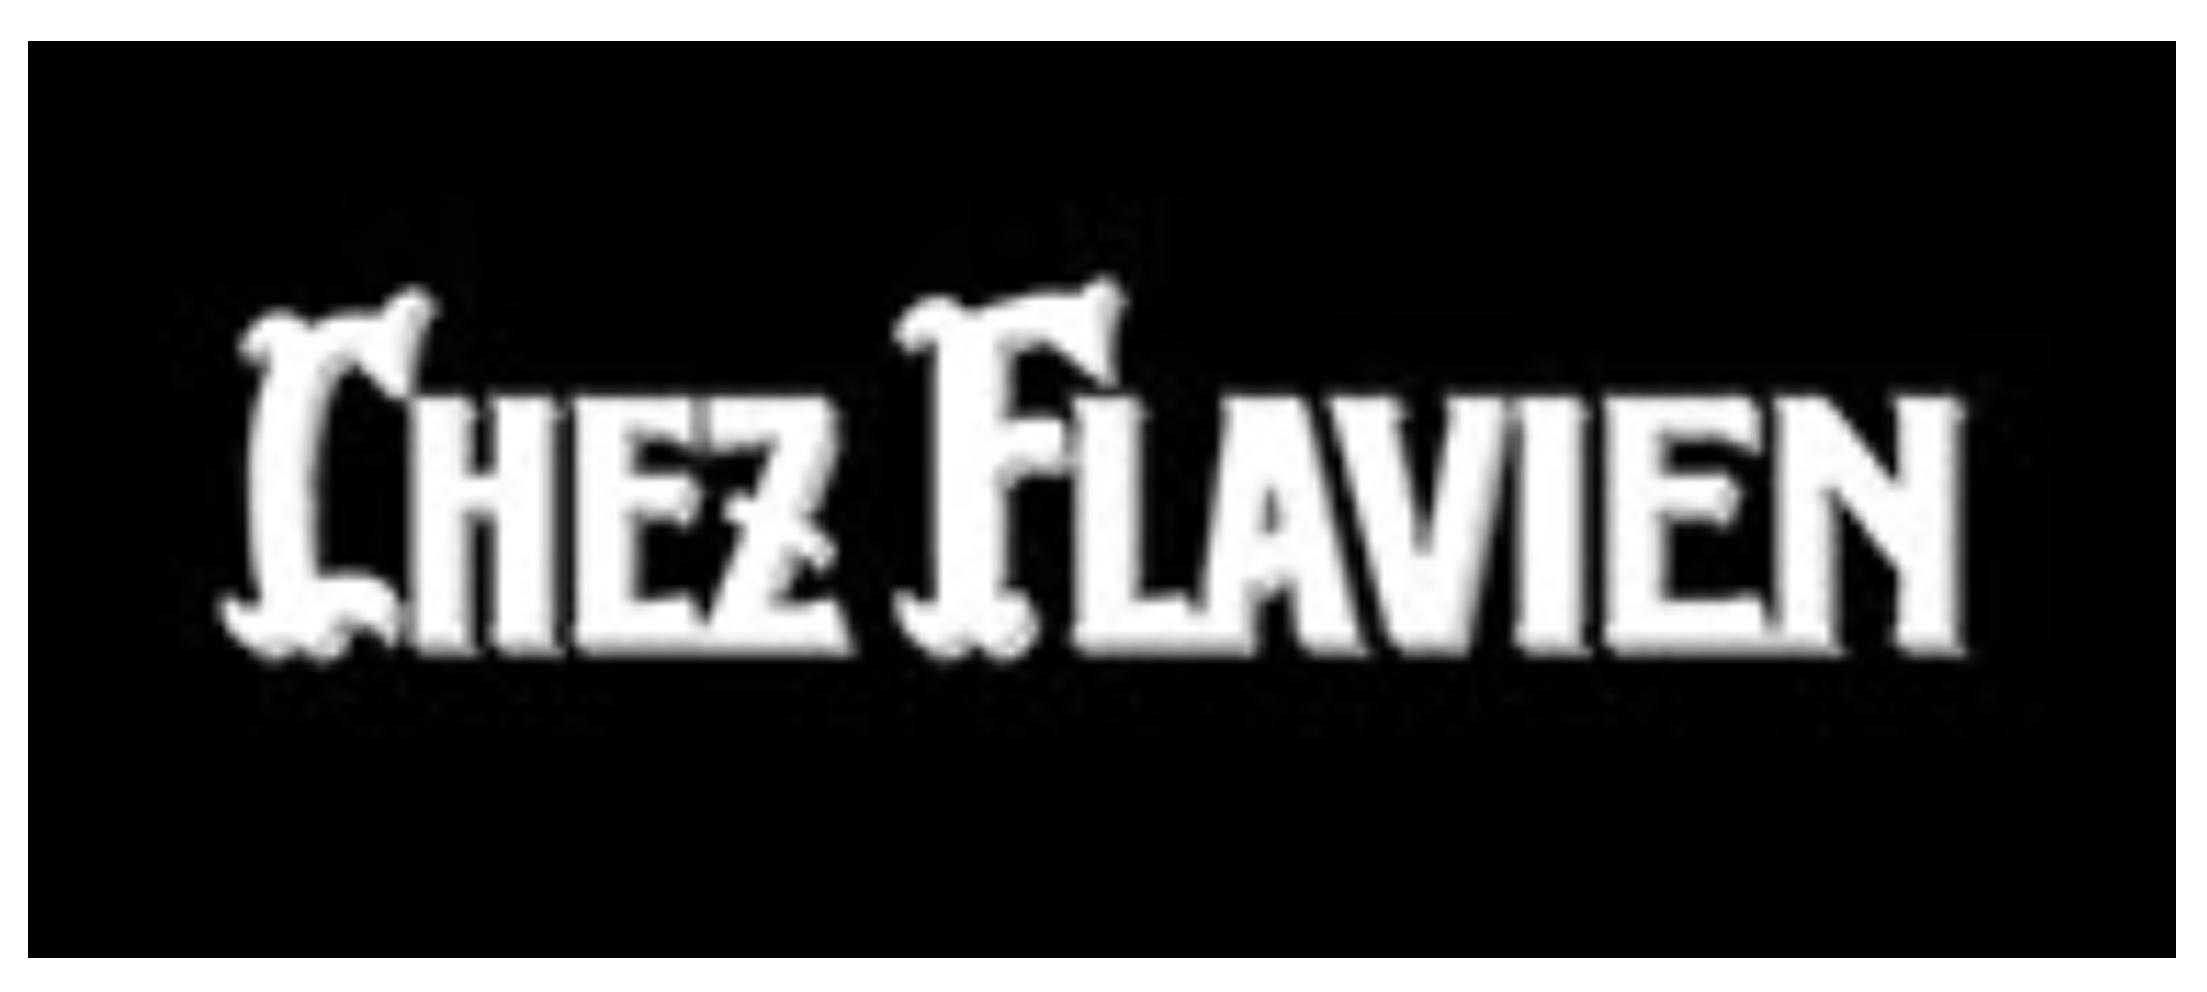 Chez Flavien